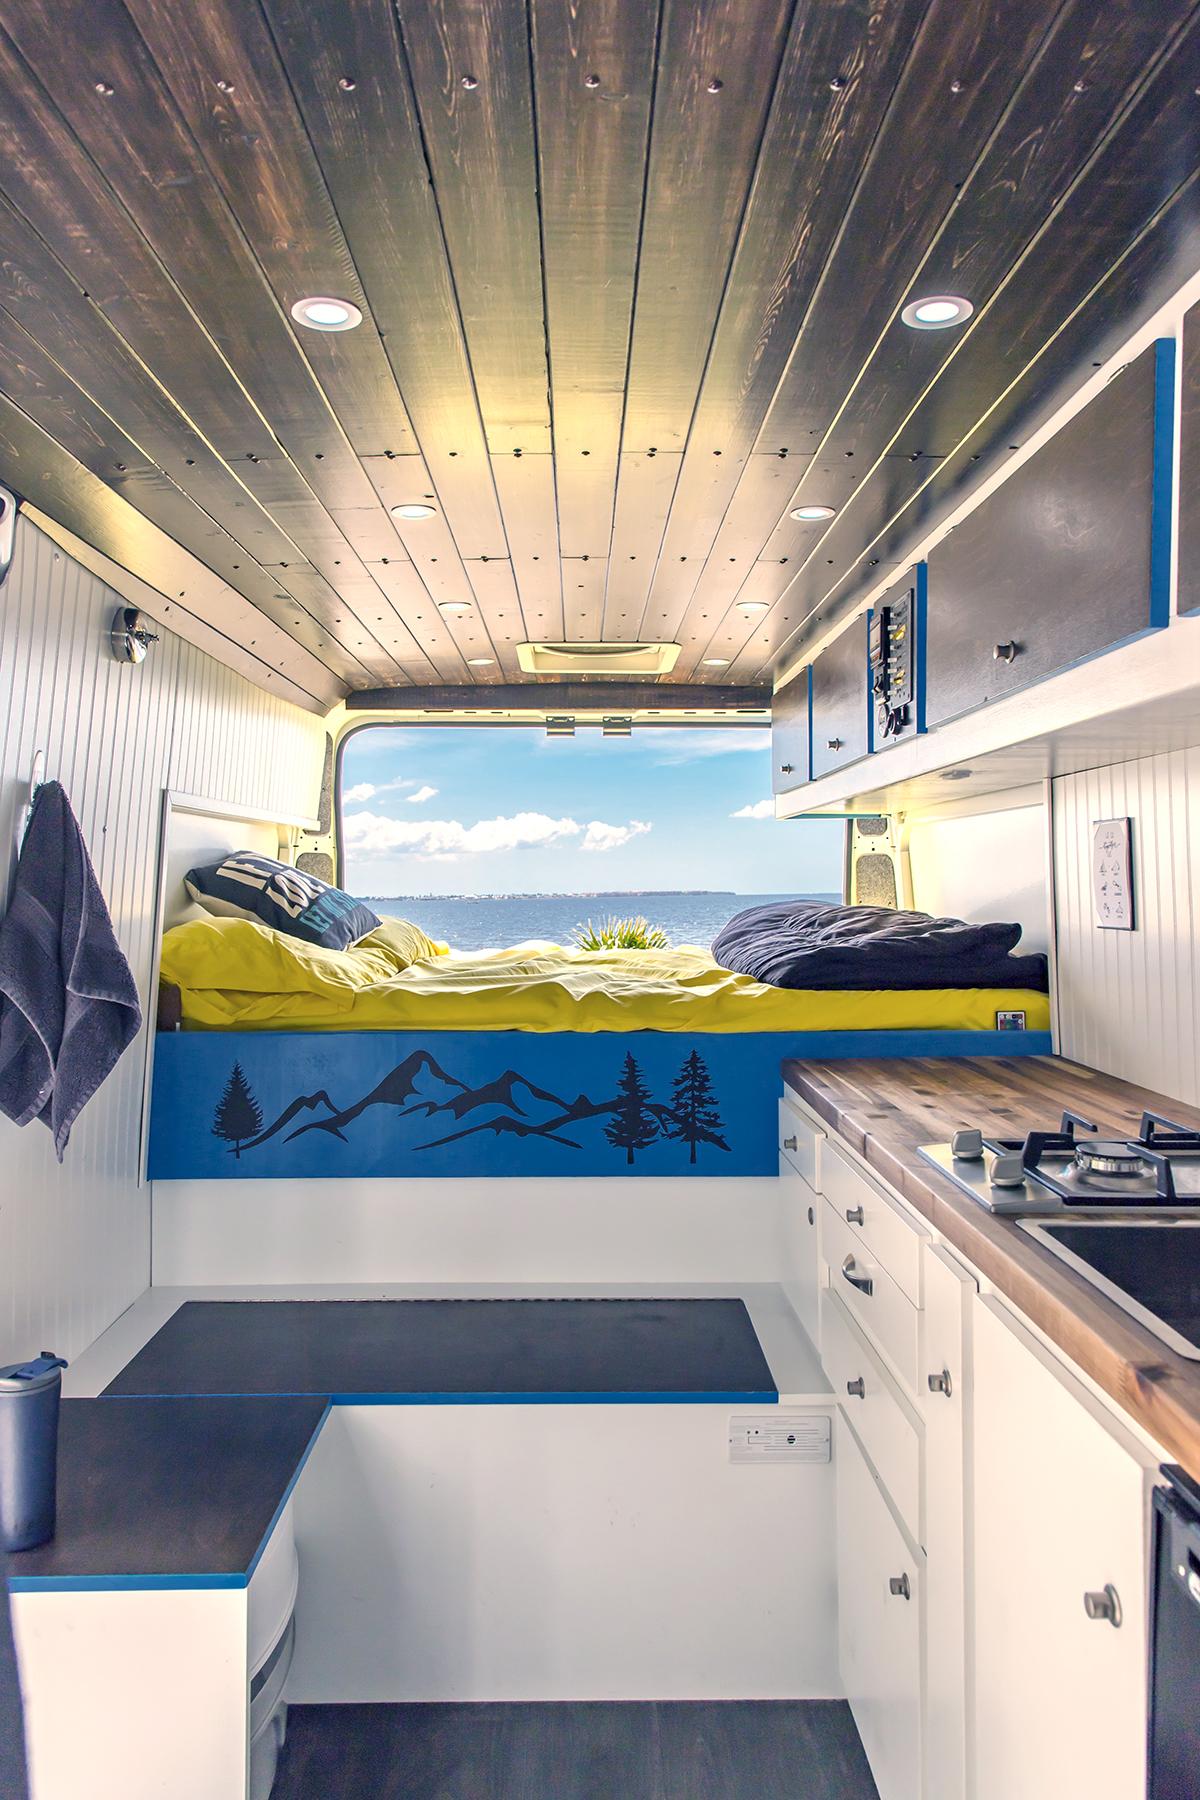 promaster camper van interior vanlife beach life